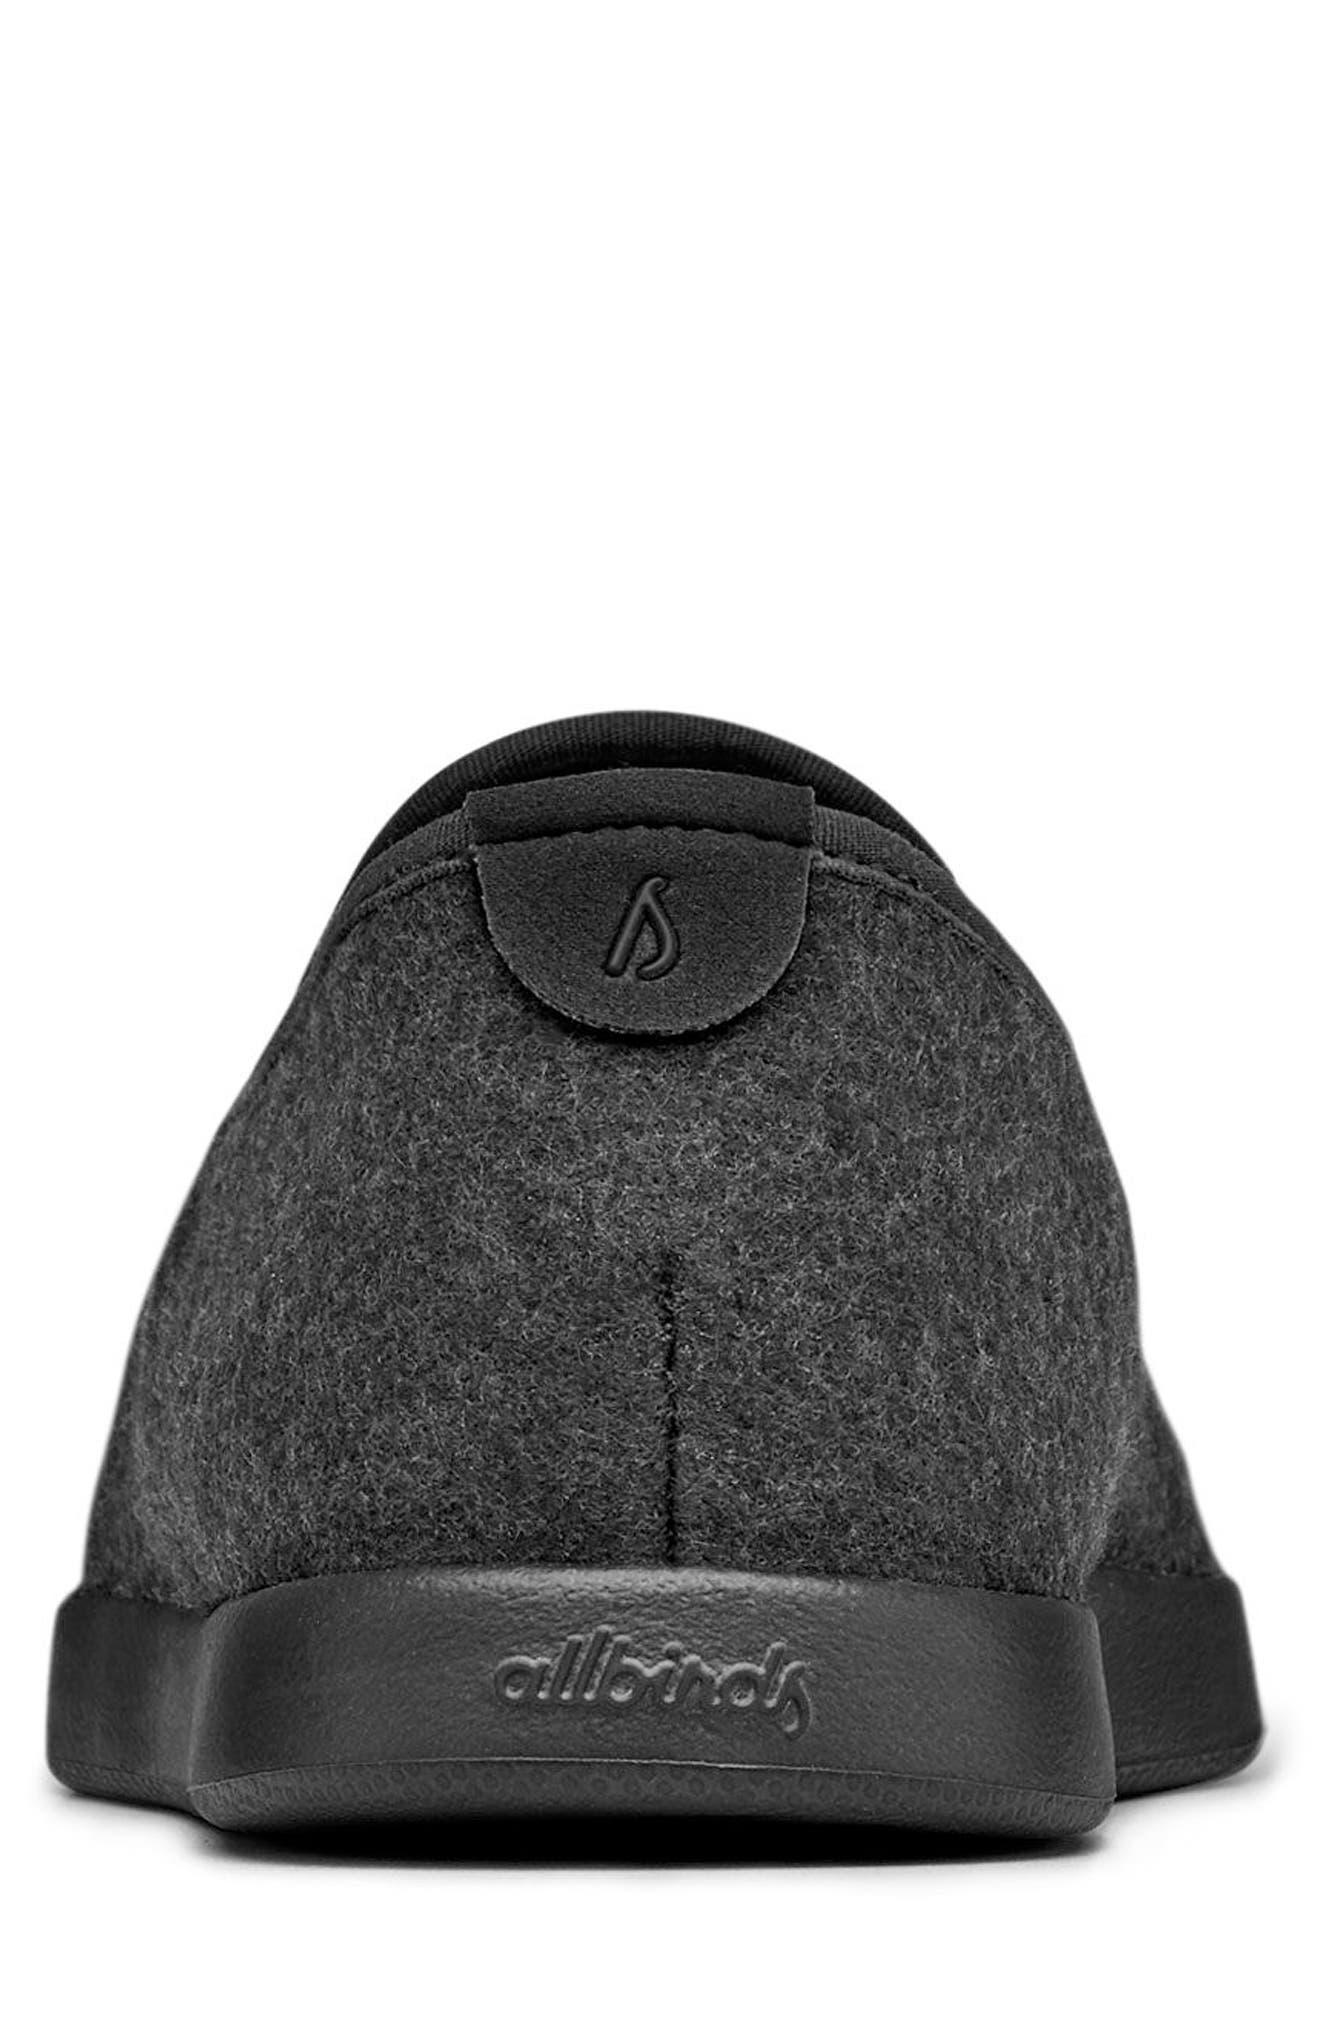 Wool Lounger,                             Alternate thumbnail 3, color,                             Natural Black